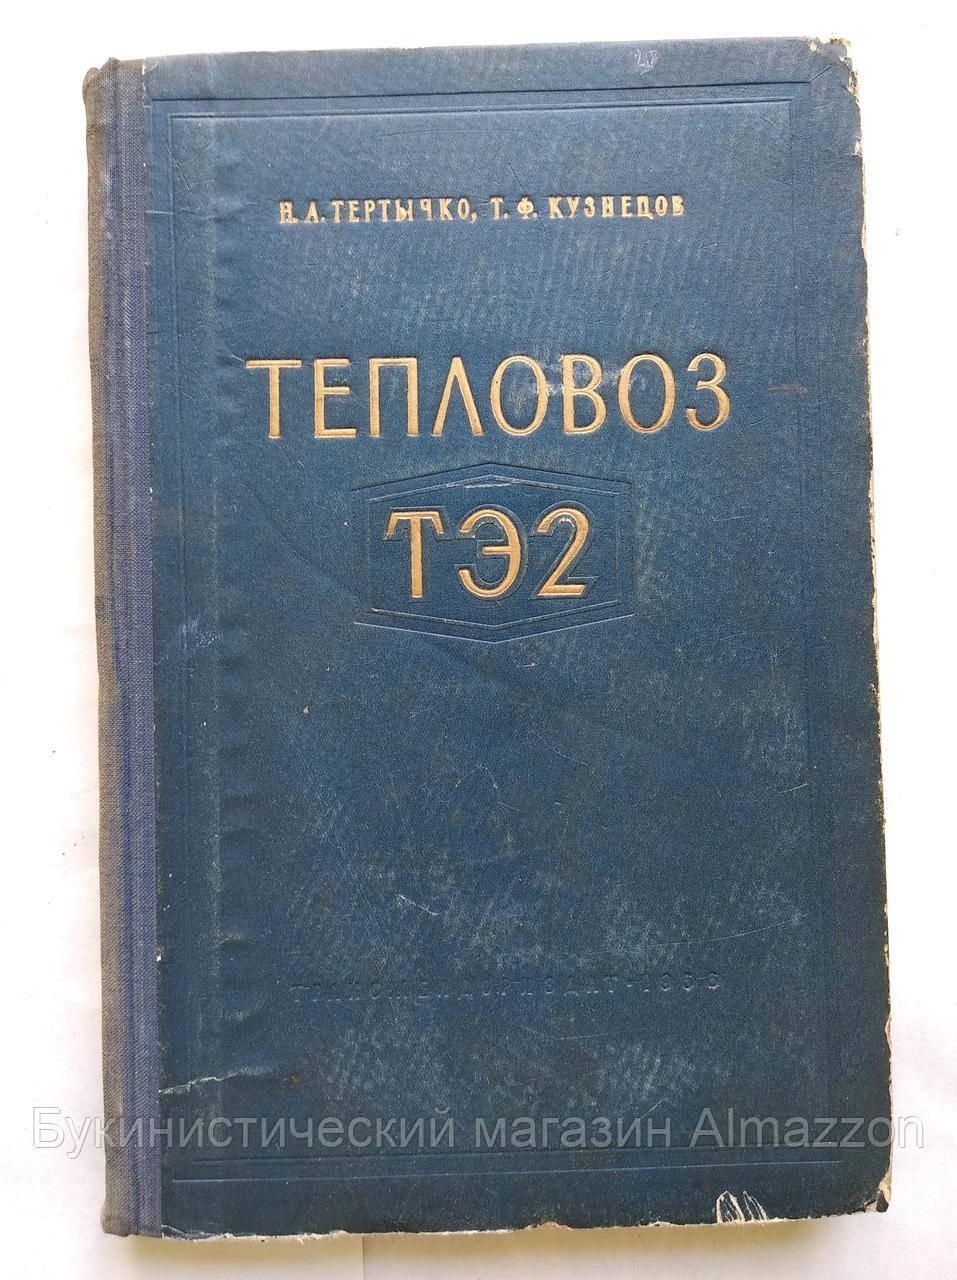 Н.Тертычко Тепловоз ТЭ2 (устройство, уход и ремонт), фото 1